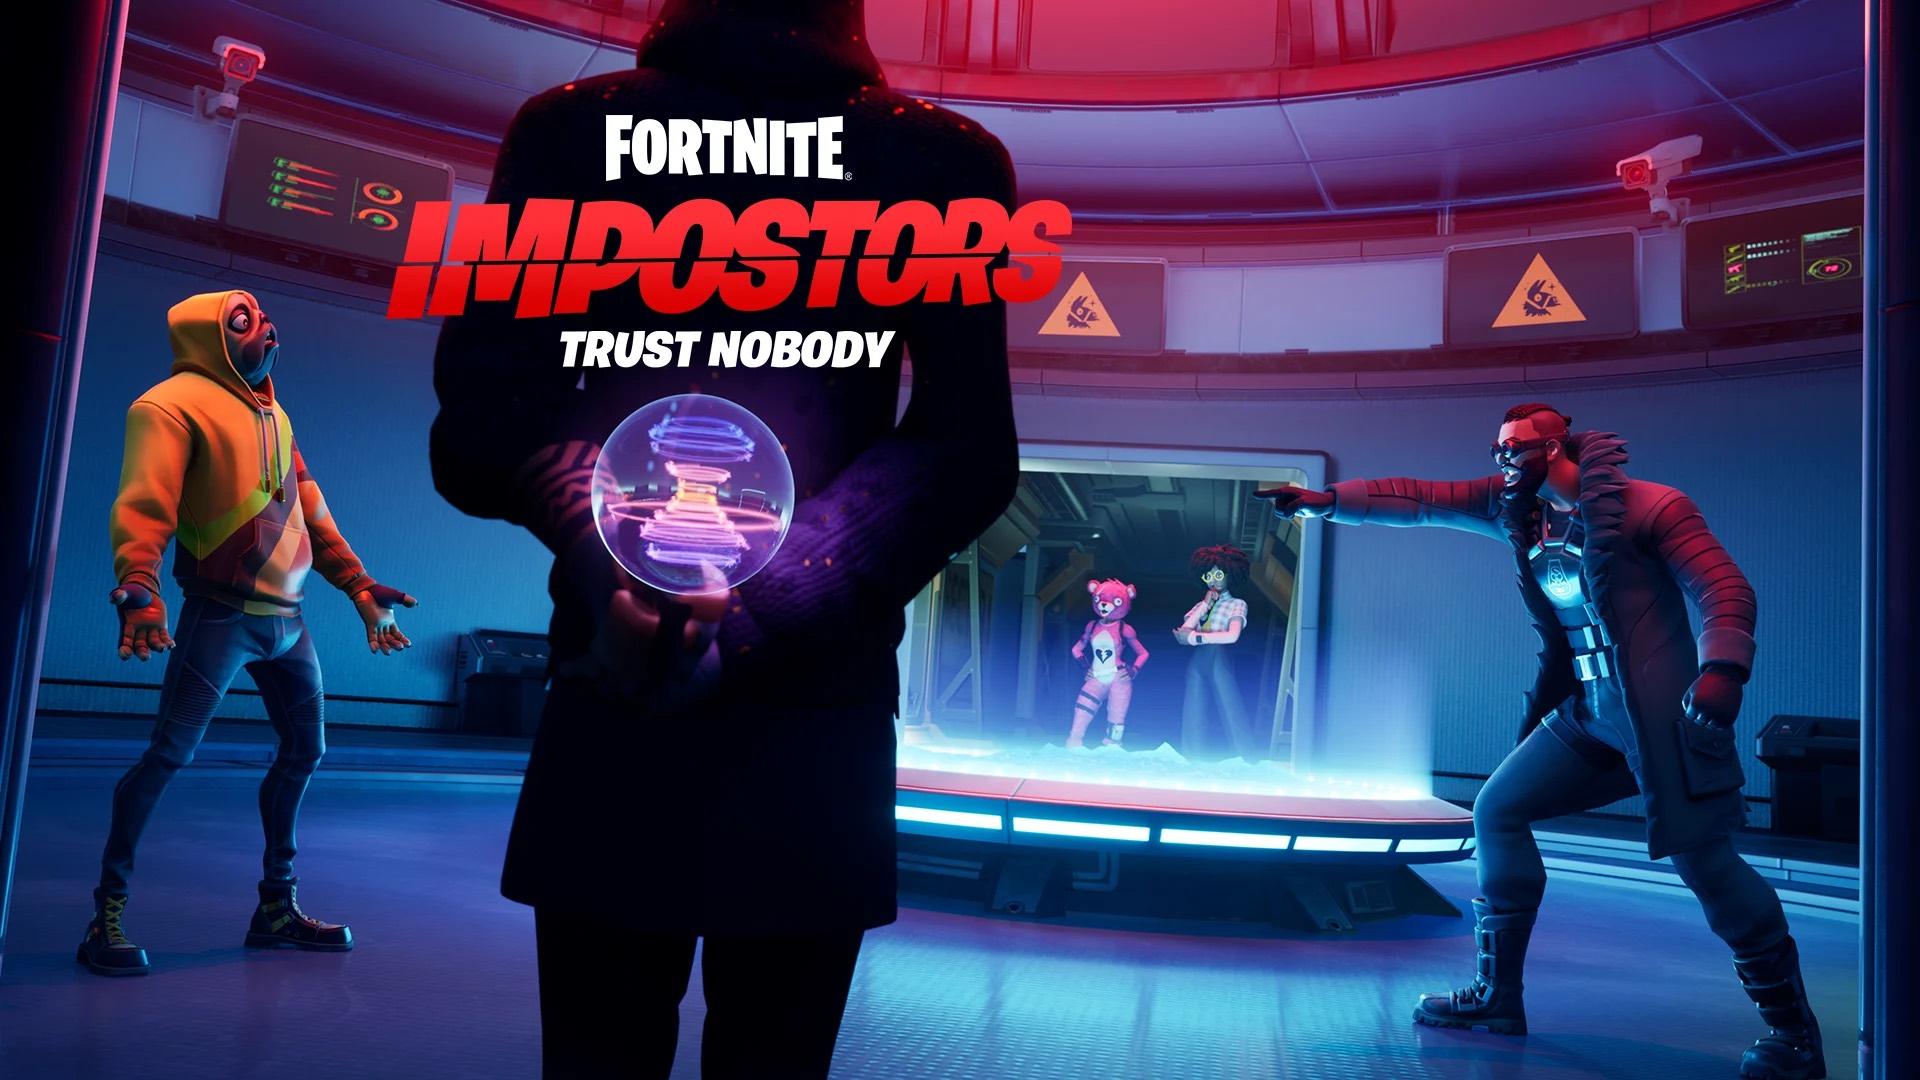 Fortnite Adds Impostors Mode